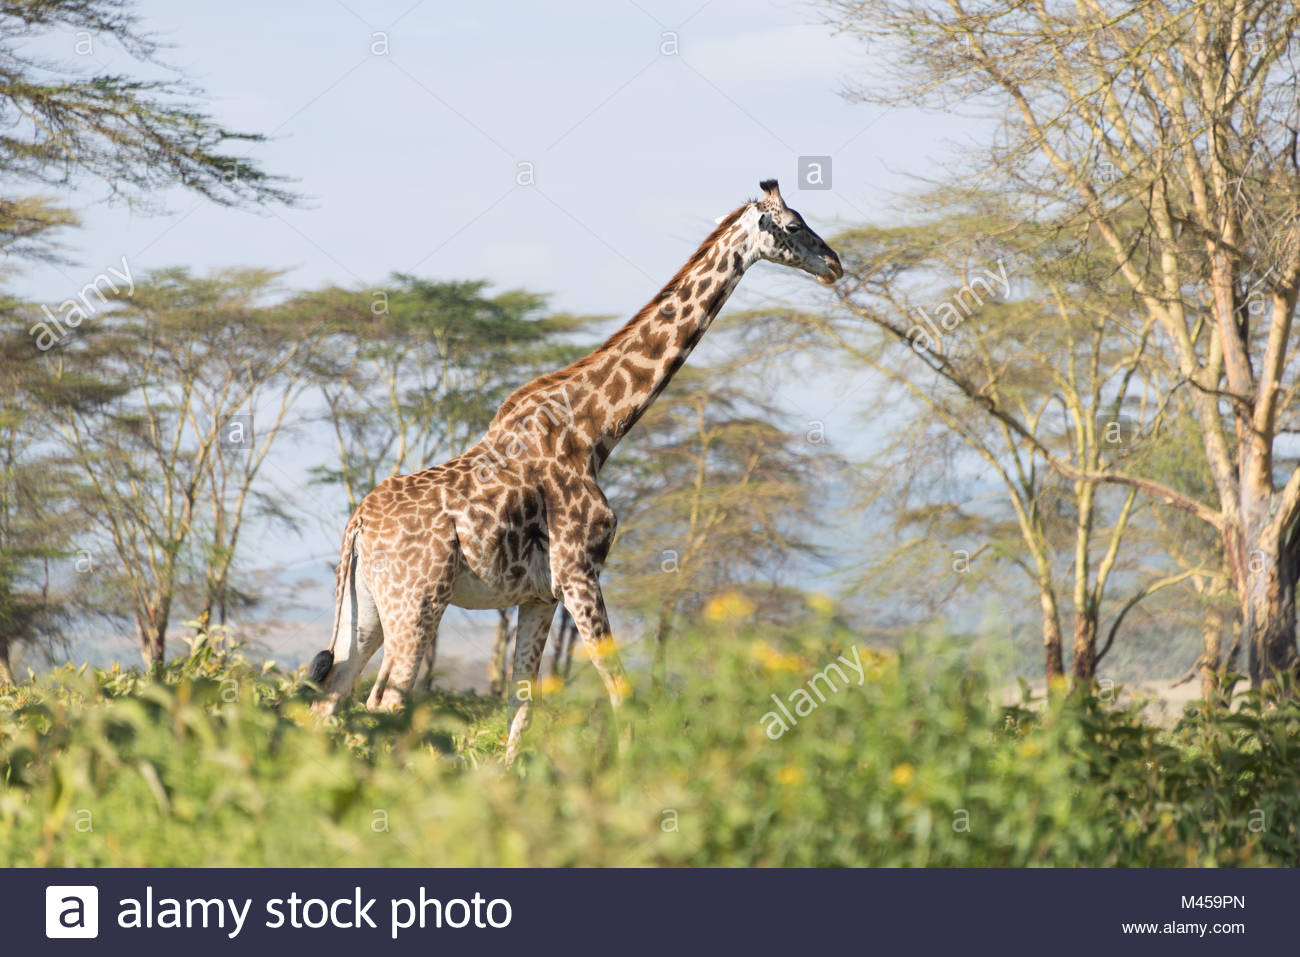 Giraffe walking on horizon with acacias behind - Stock Image